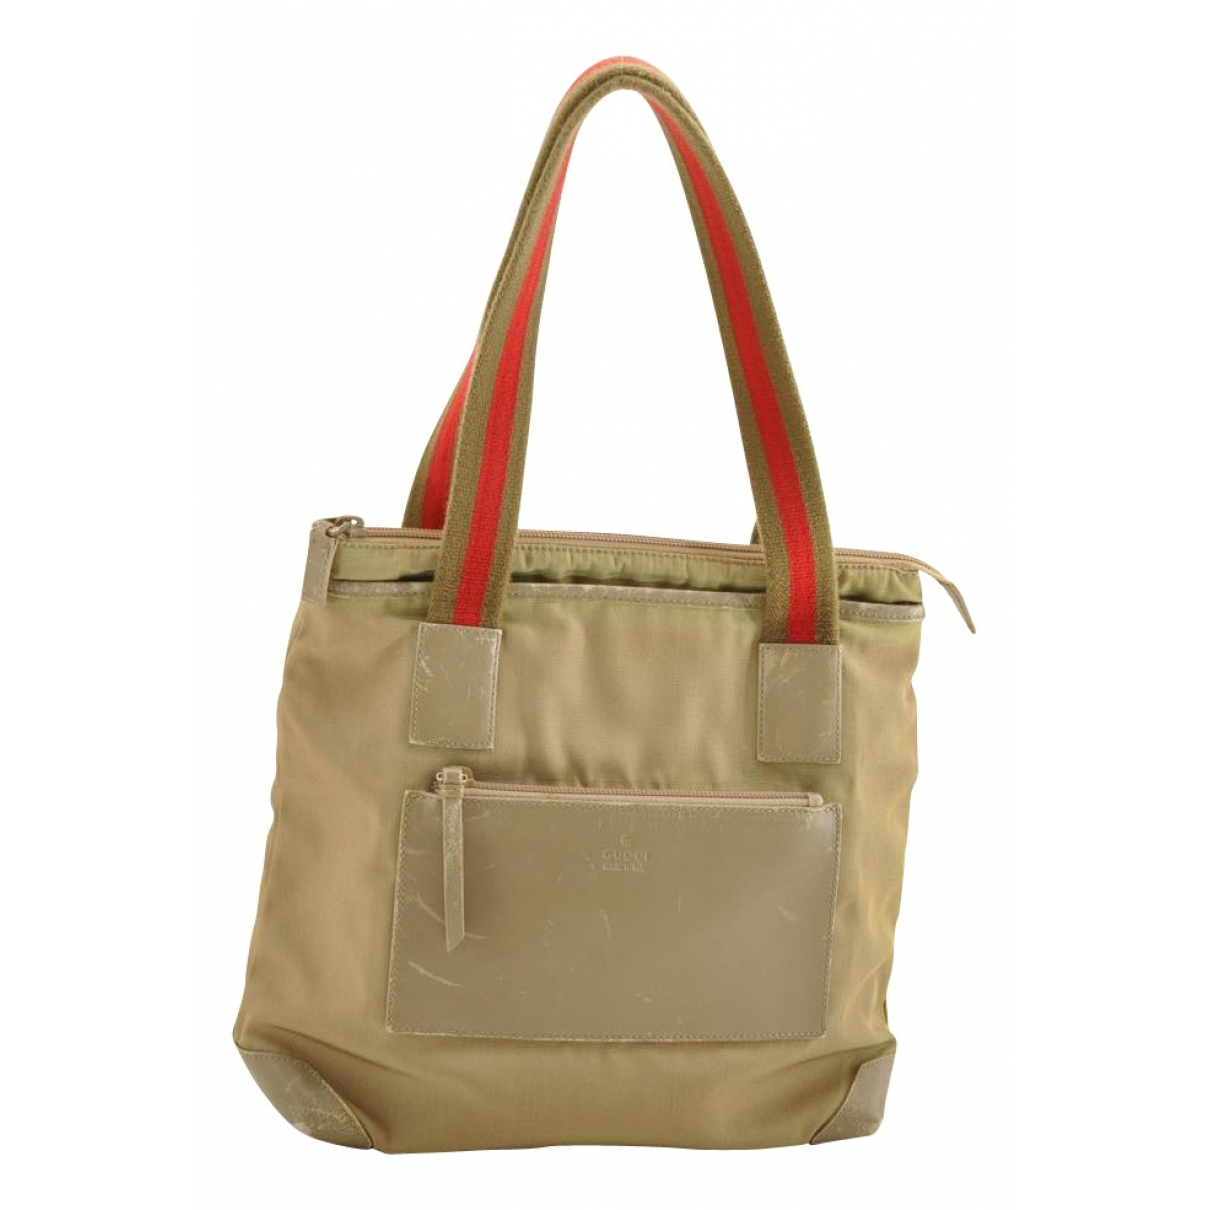 Gucci N Khaki Cloth handbag for Women N